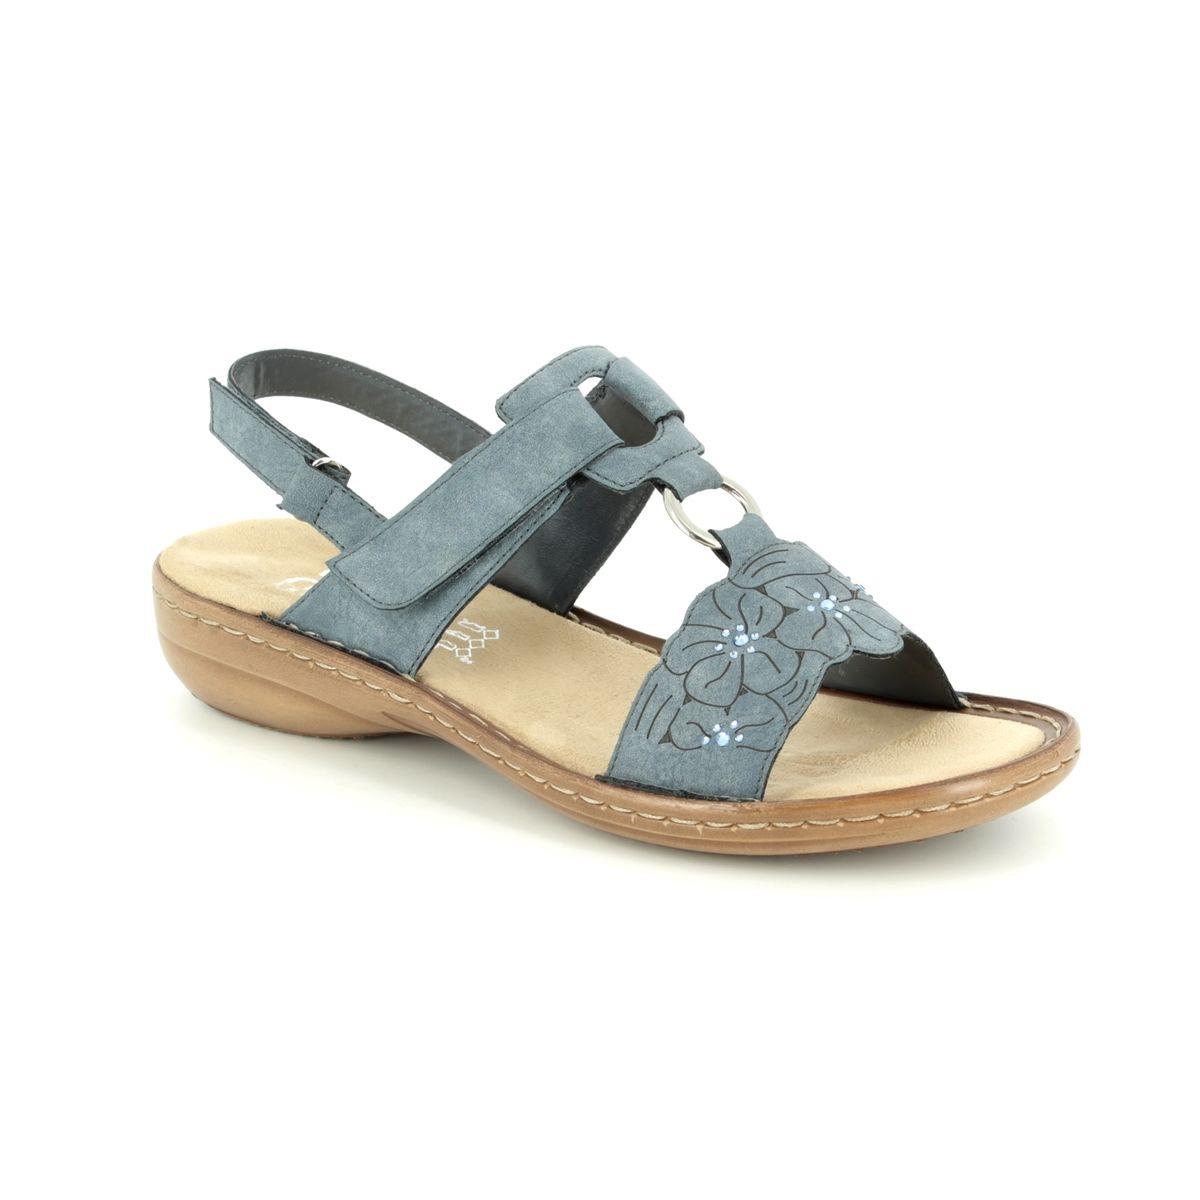 c707a82705 Rieker Sandals - Denim blue - 60843-14 REGIFLO